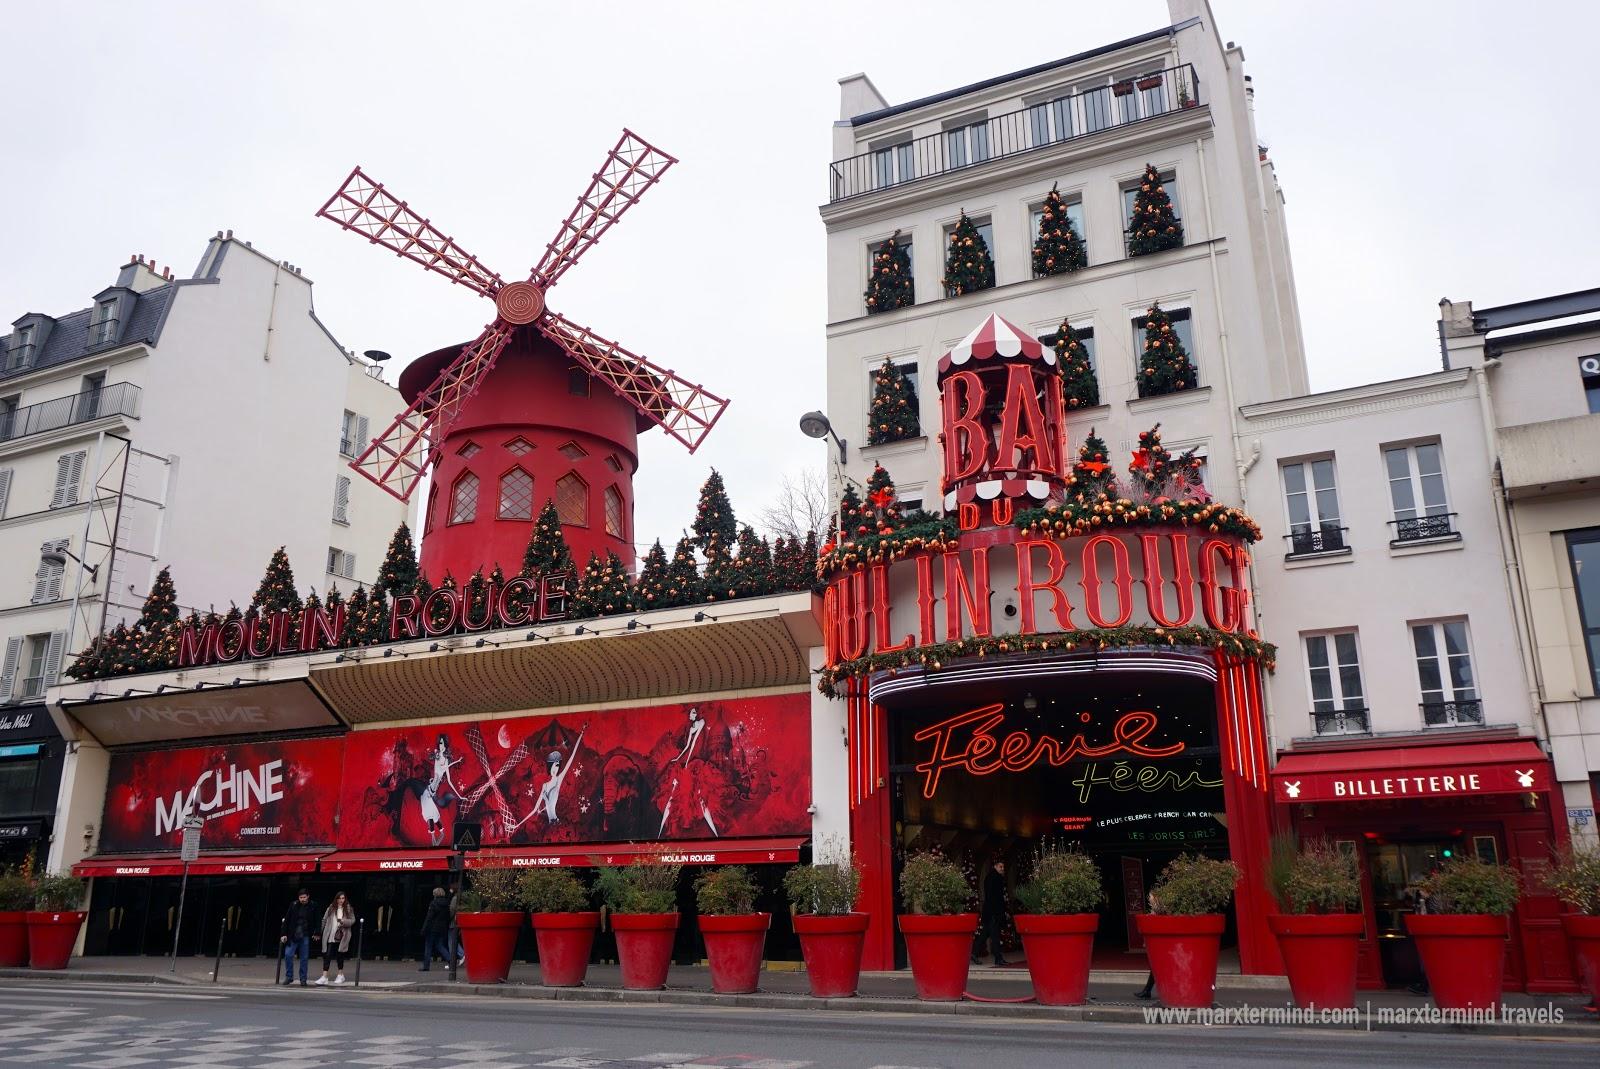 Moulin Rouge in Paris, France